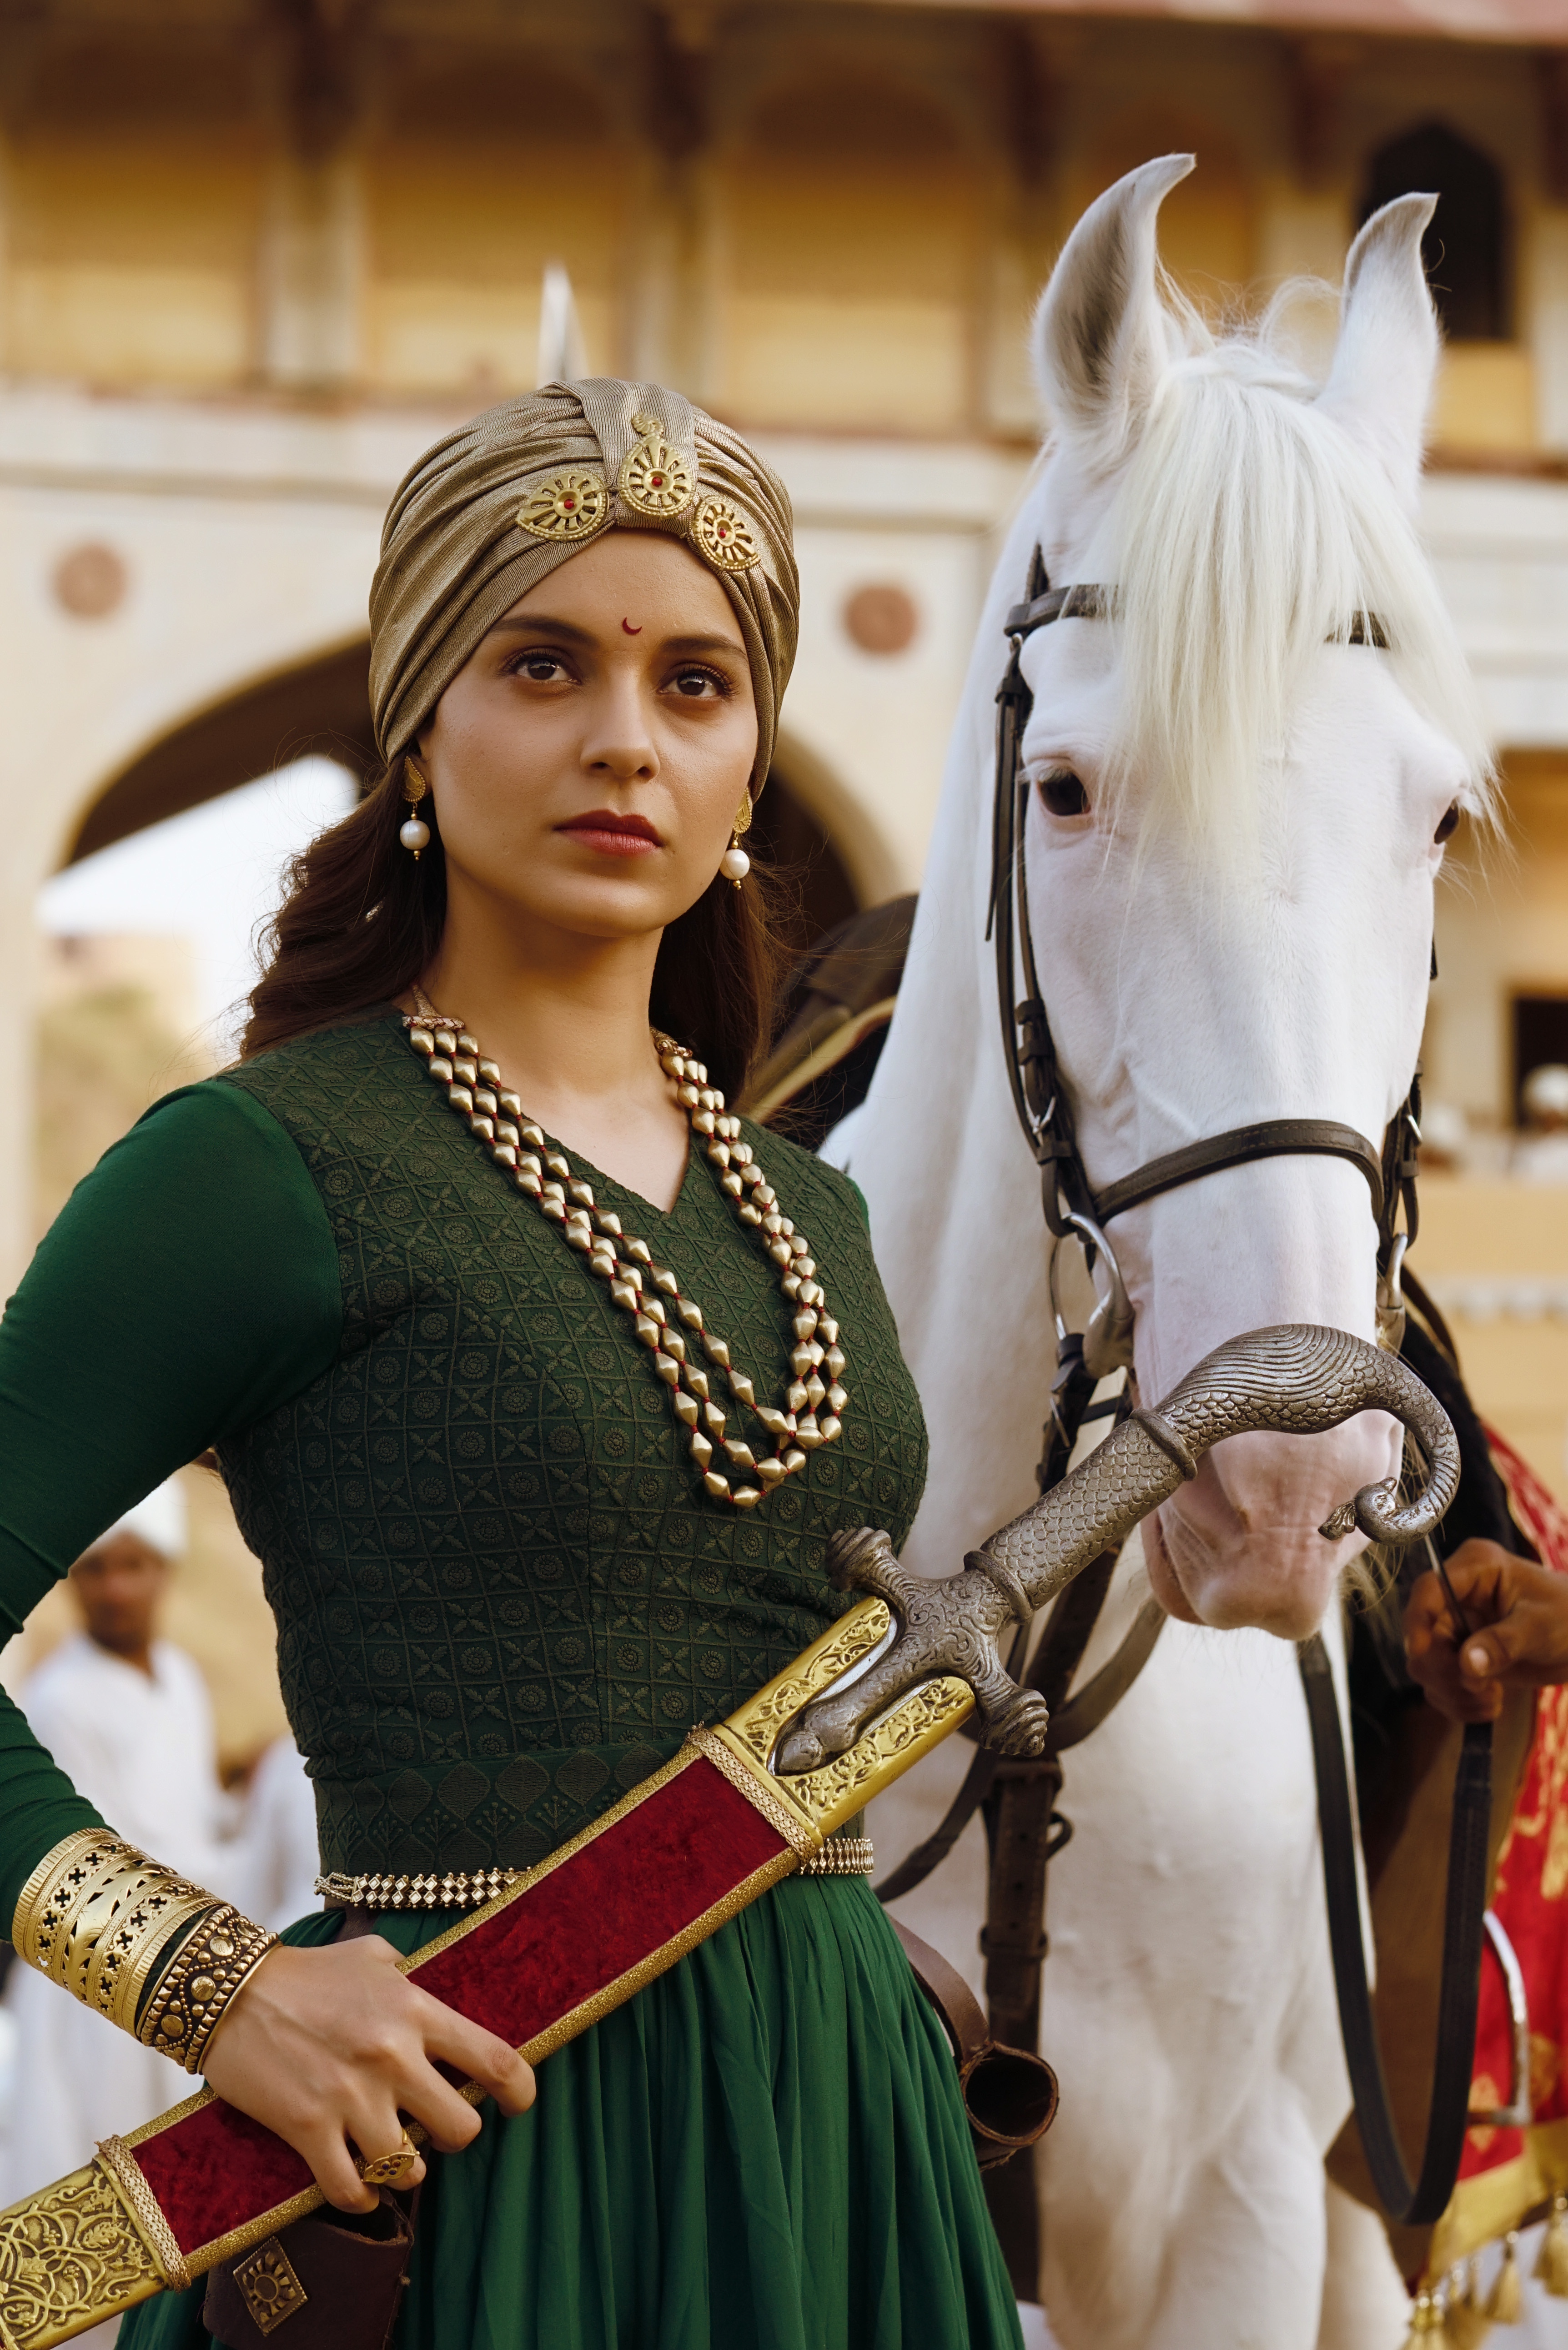 Celebrity Kangana Ranaut in Amrapali Jewellery for the movie- Manikarnika